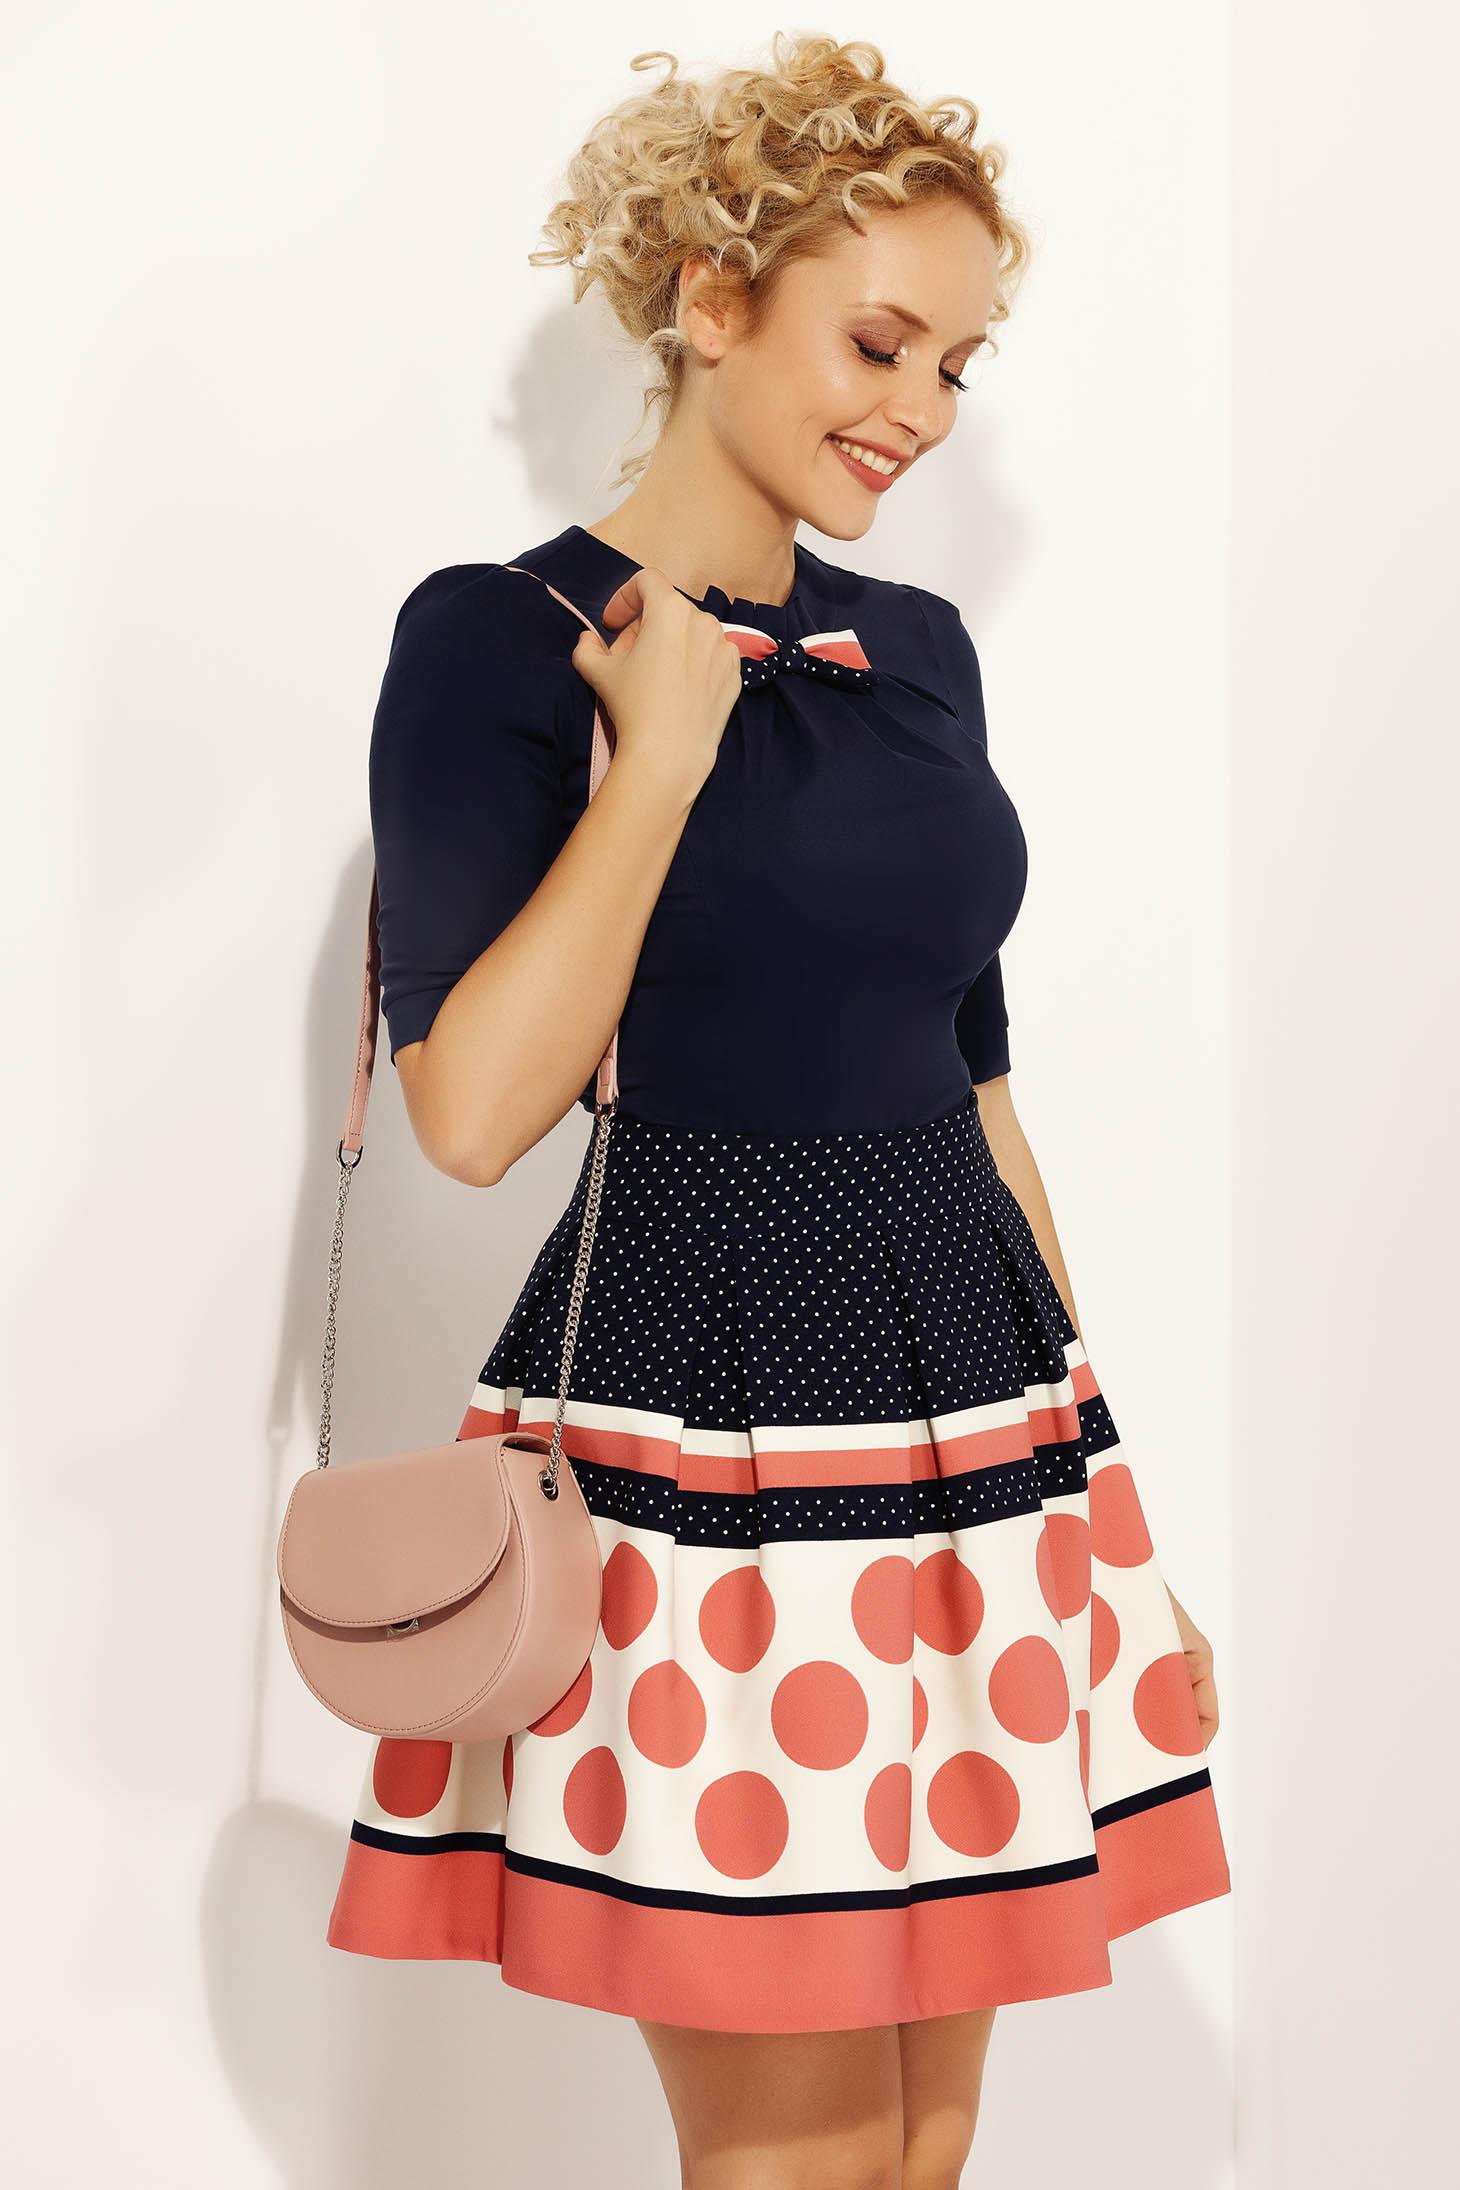 Fofy rosa office cloche skirt slightly elastic fabric high waisted